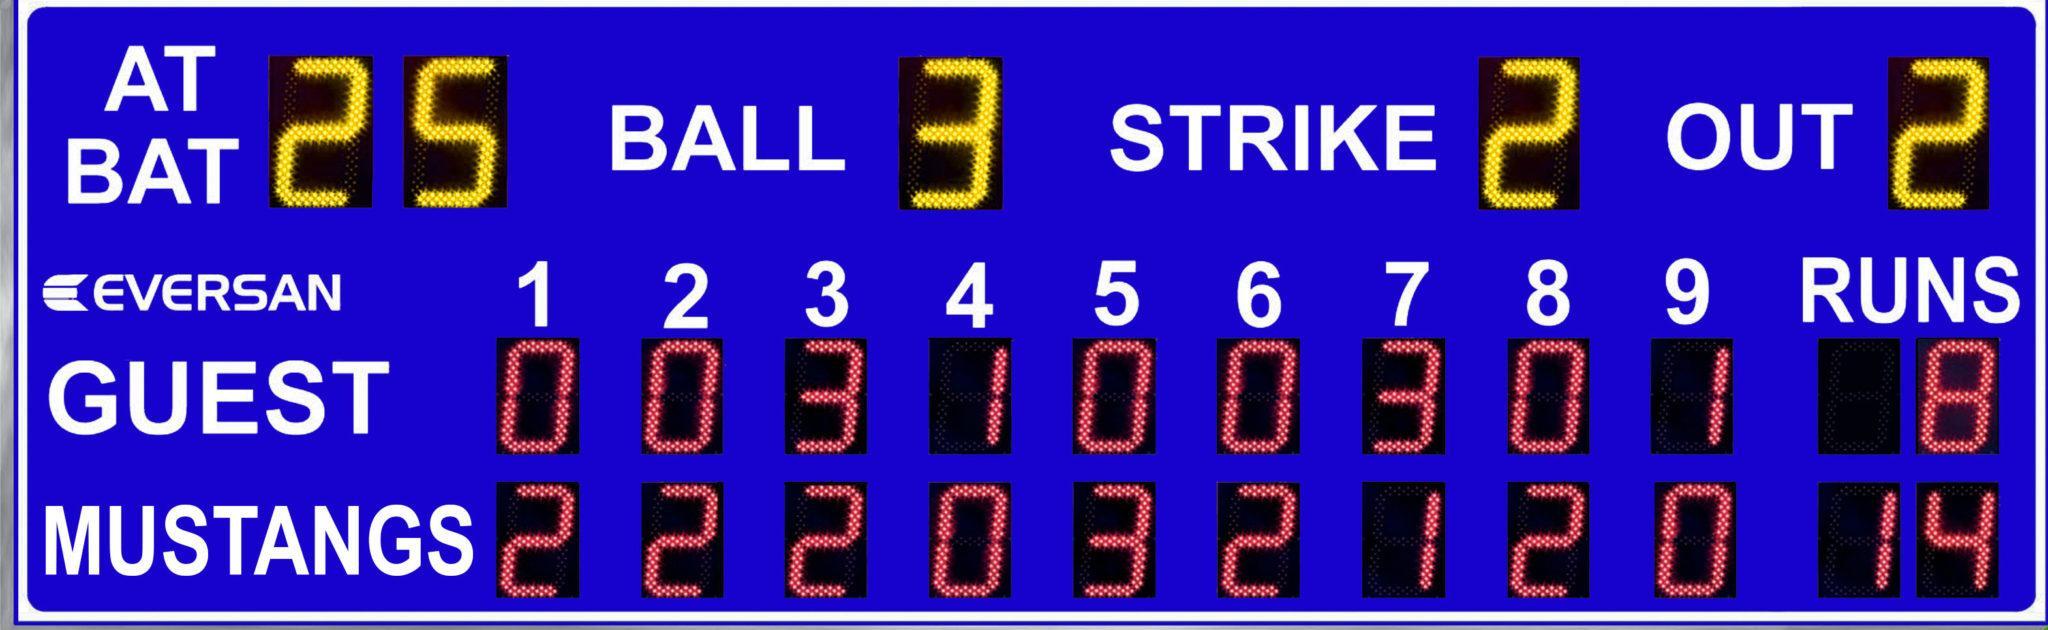 Baseball scoreboard Model 9875